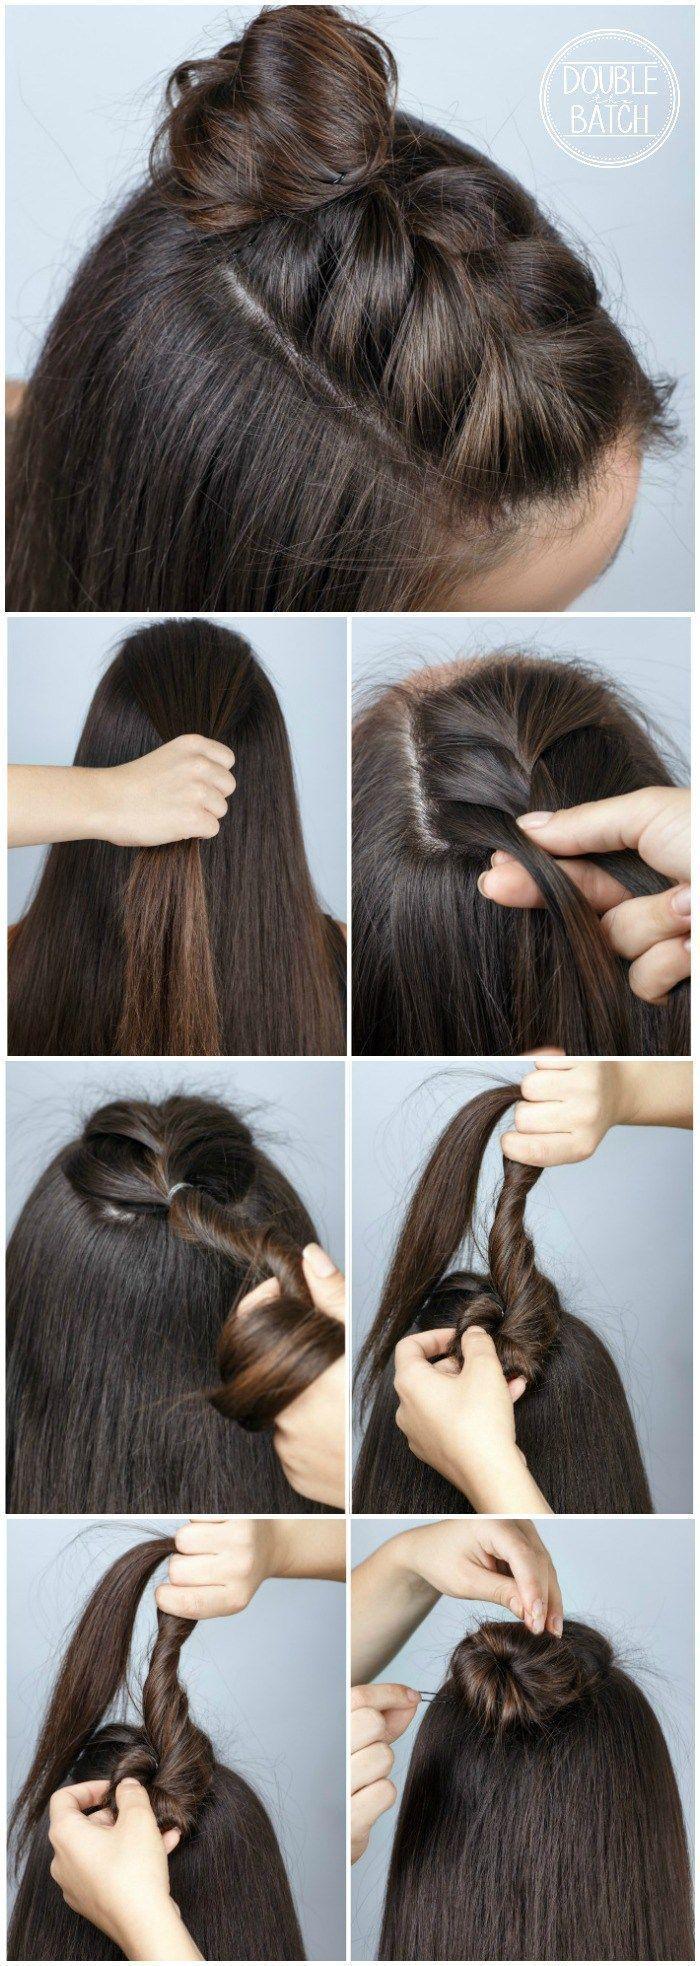 Tutoriel de coiffure facile demi-tresse - Tutoriel de coiffure vidéo - #Braid #Easy # ..., #...